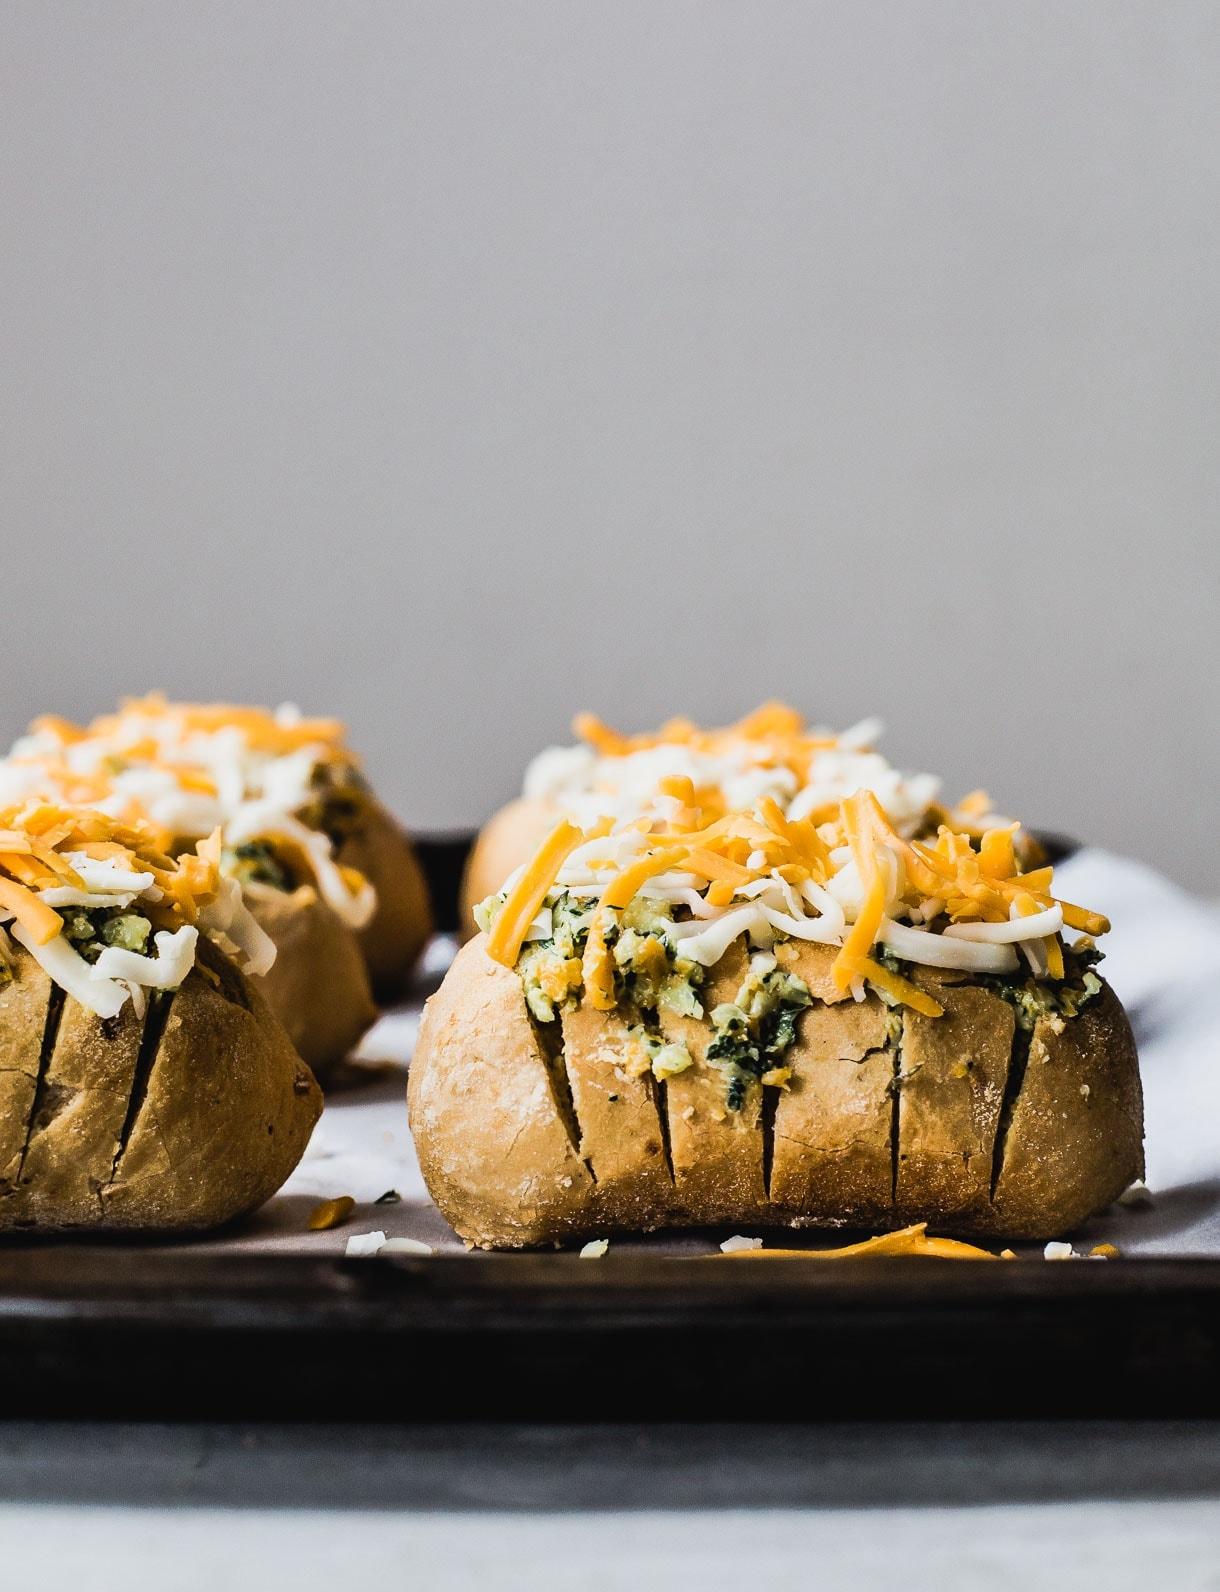 Cheesy Pull-Apart Hasselback Bread